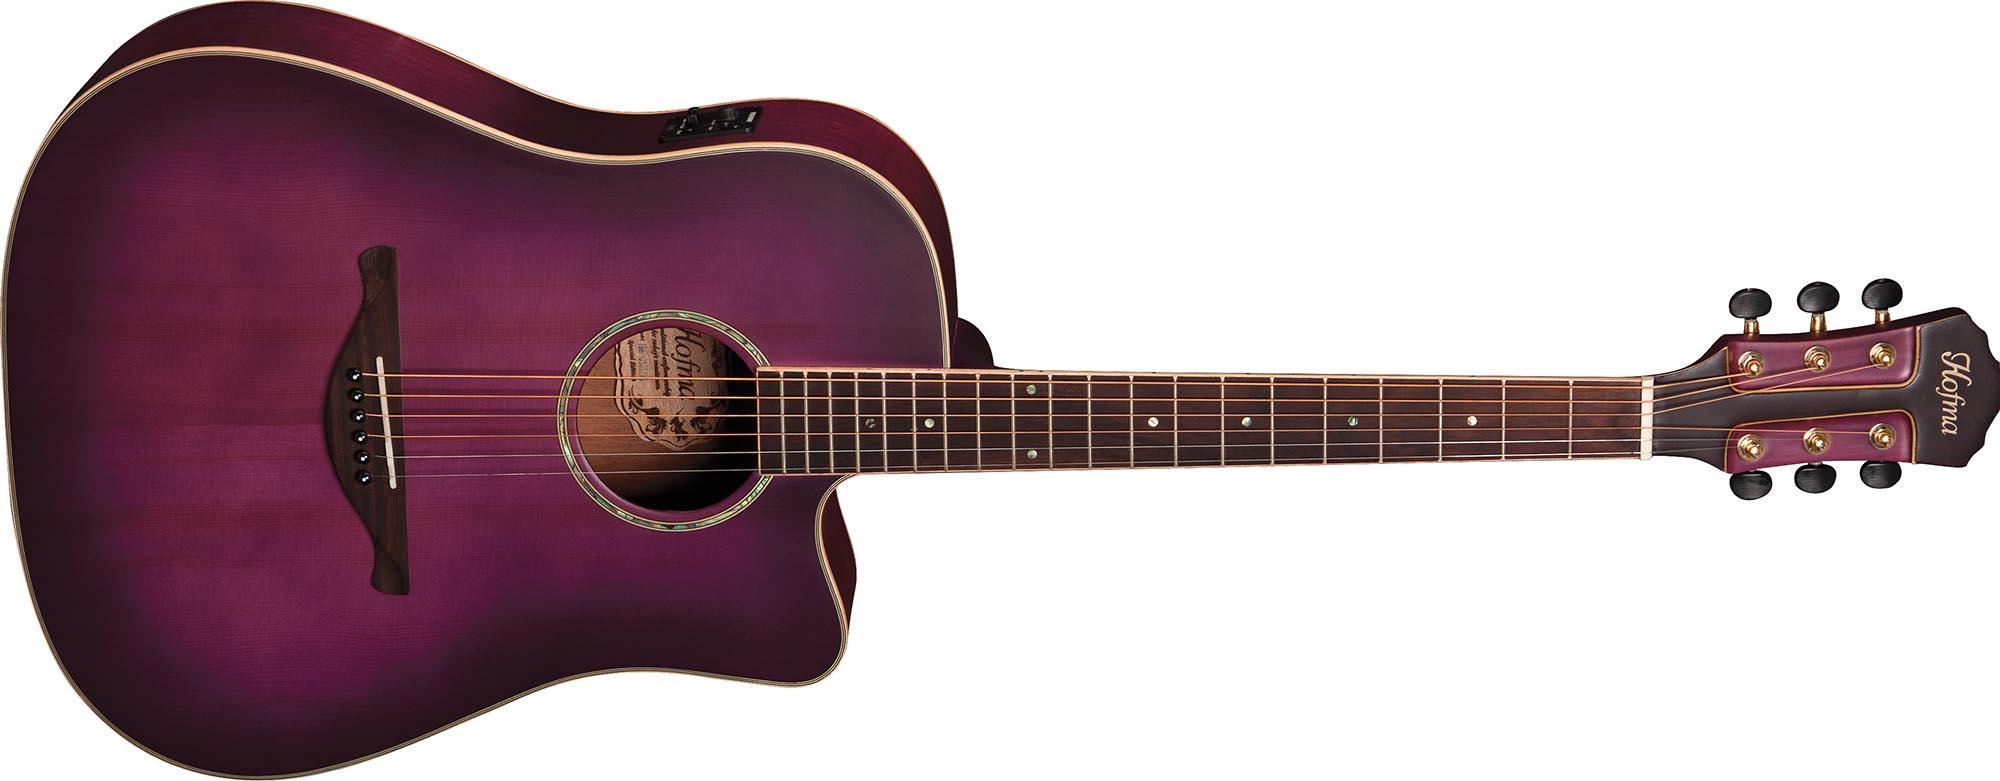 hmp350 violao folk dreadnought eletroacustico tampo solido hofma hmp350 stvs violeta acetinado visao frontal